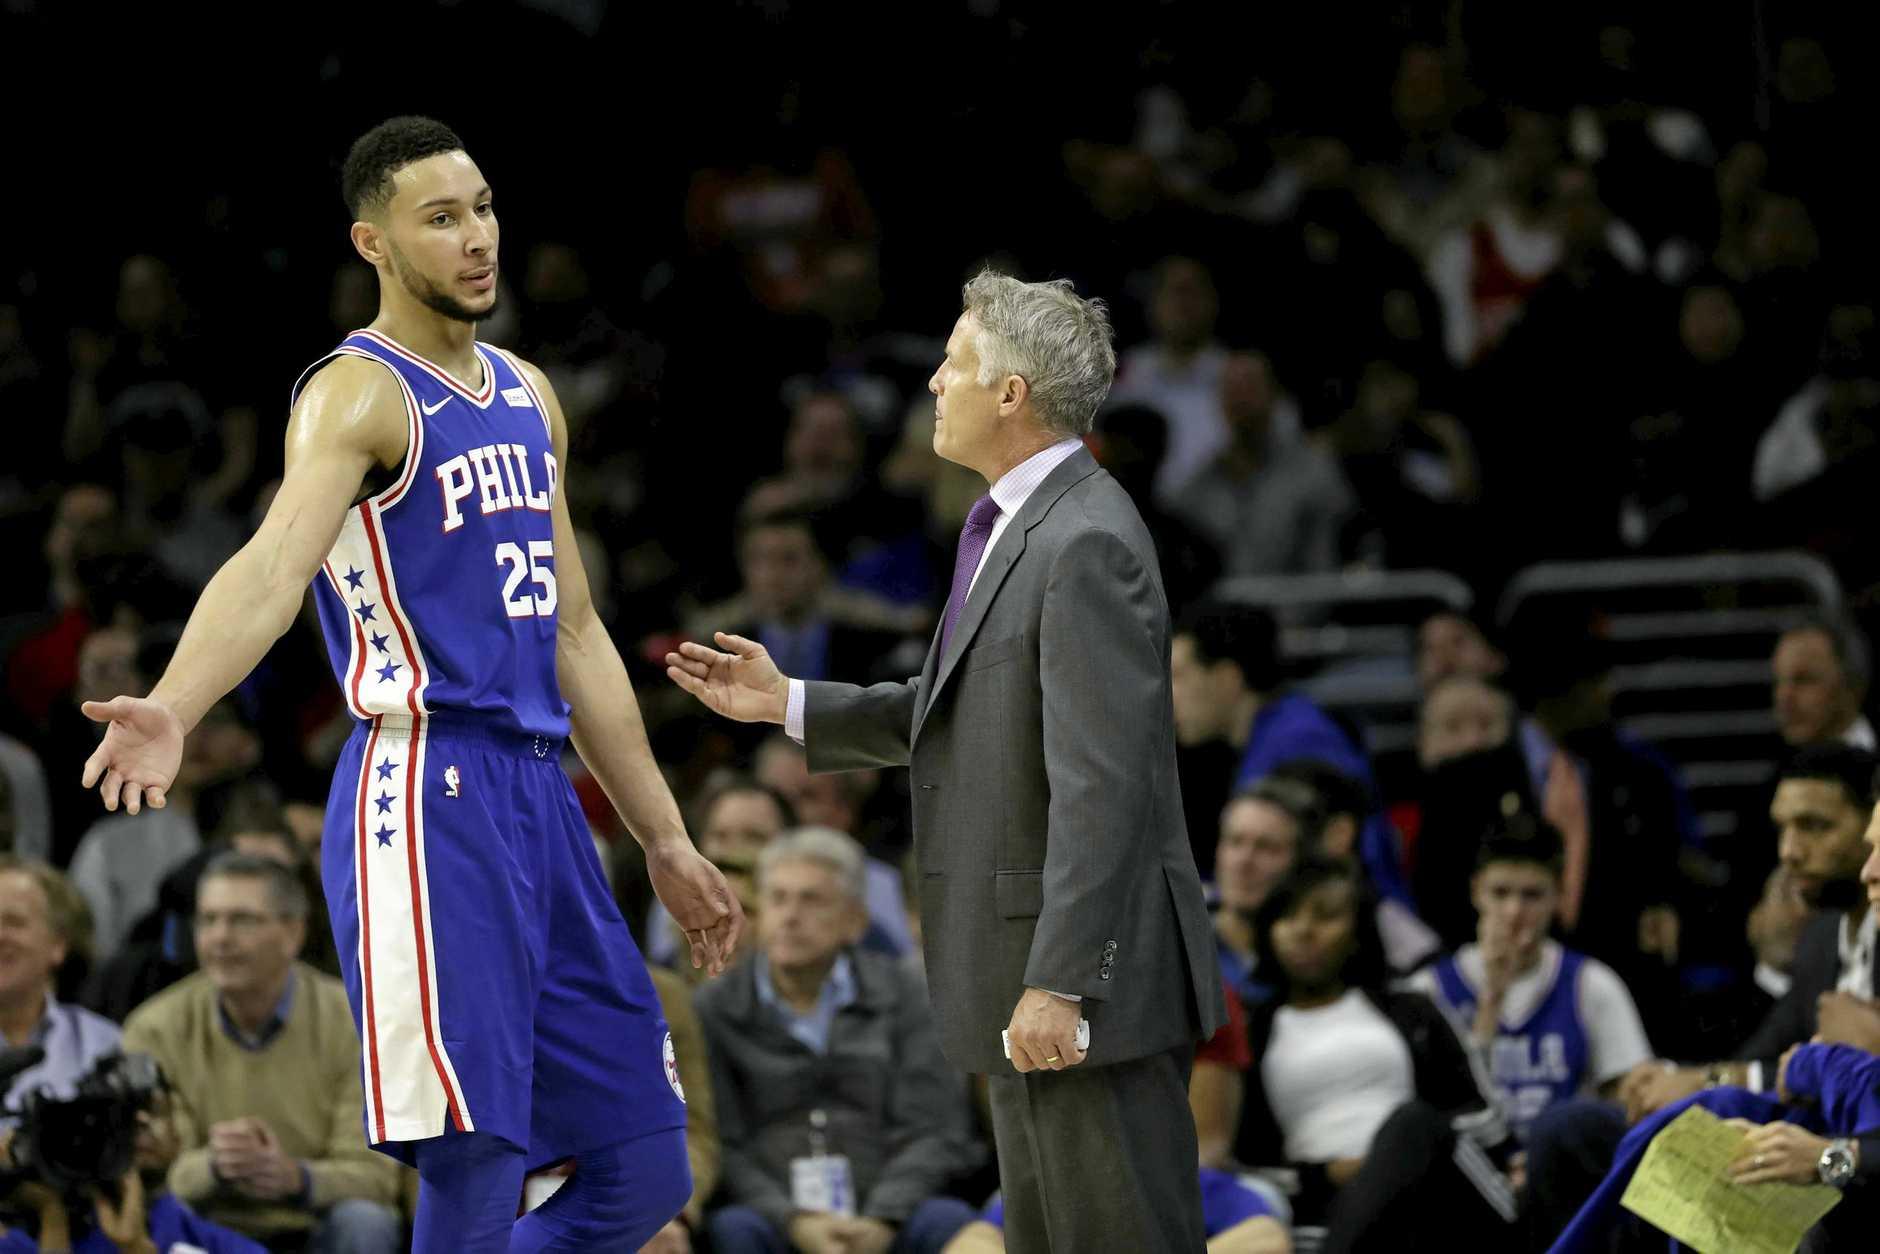 Philadelphia 76ers' Ben Simmons, left, talks with Brett Brown during an NBA basketball game against the Phoenix Suns, Monday, Dec. 4, 2017, in Philadelphia. (AP Photo/Matt Slocum)